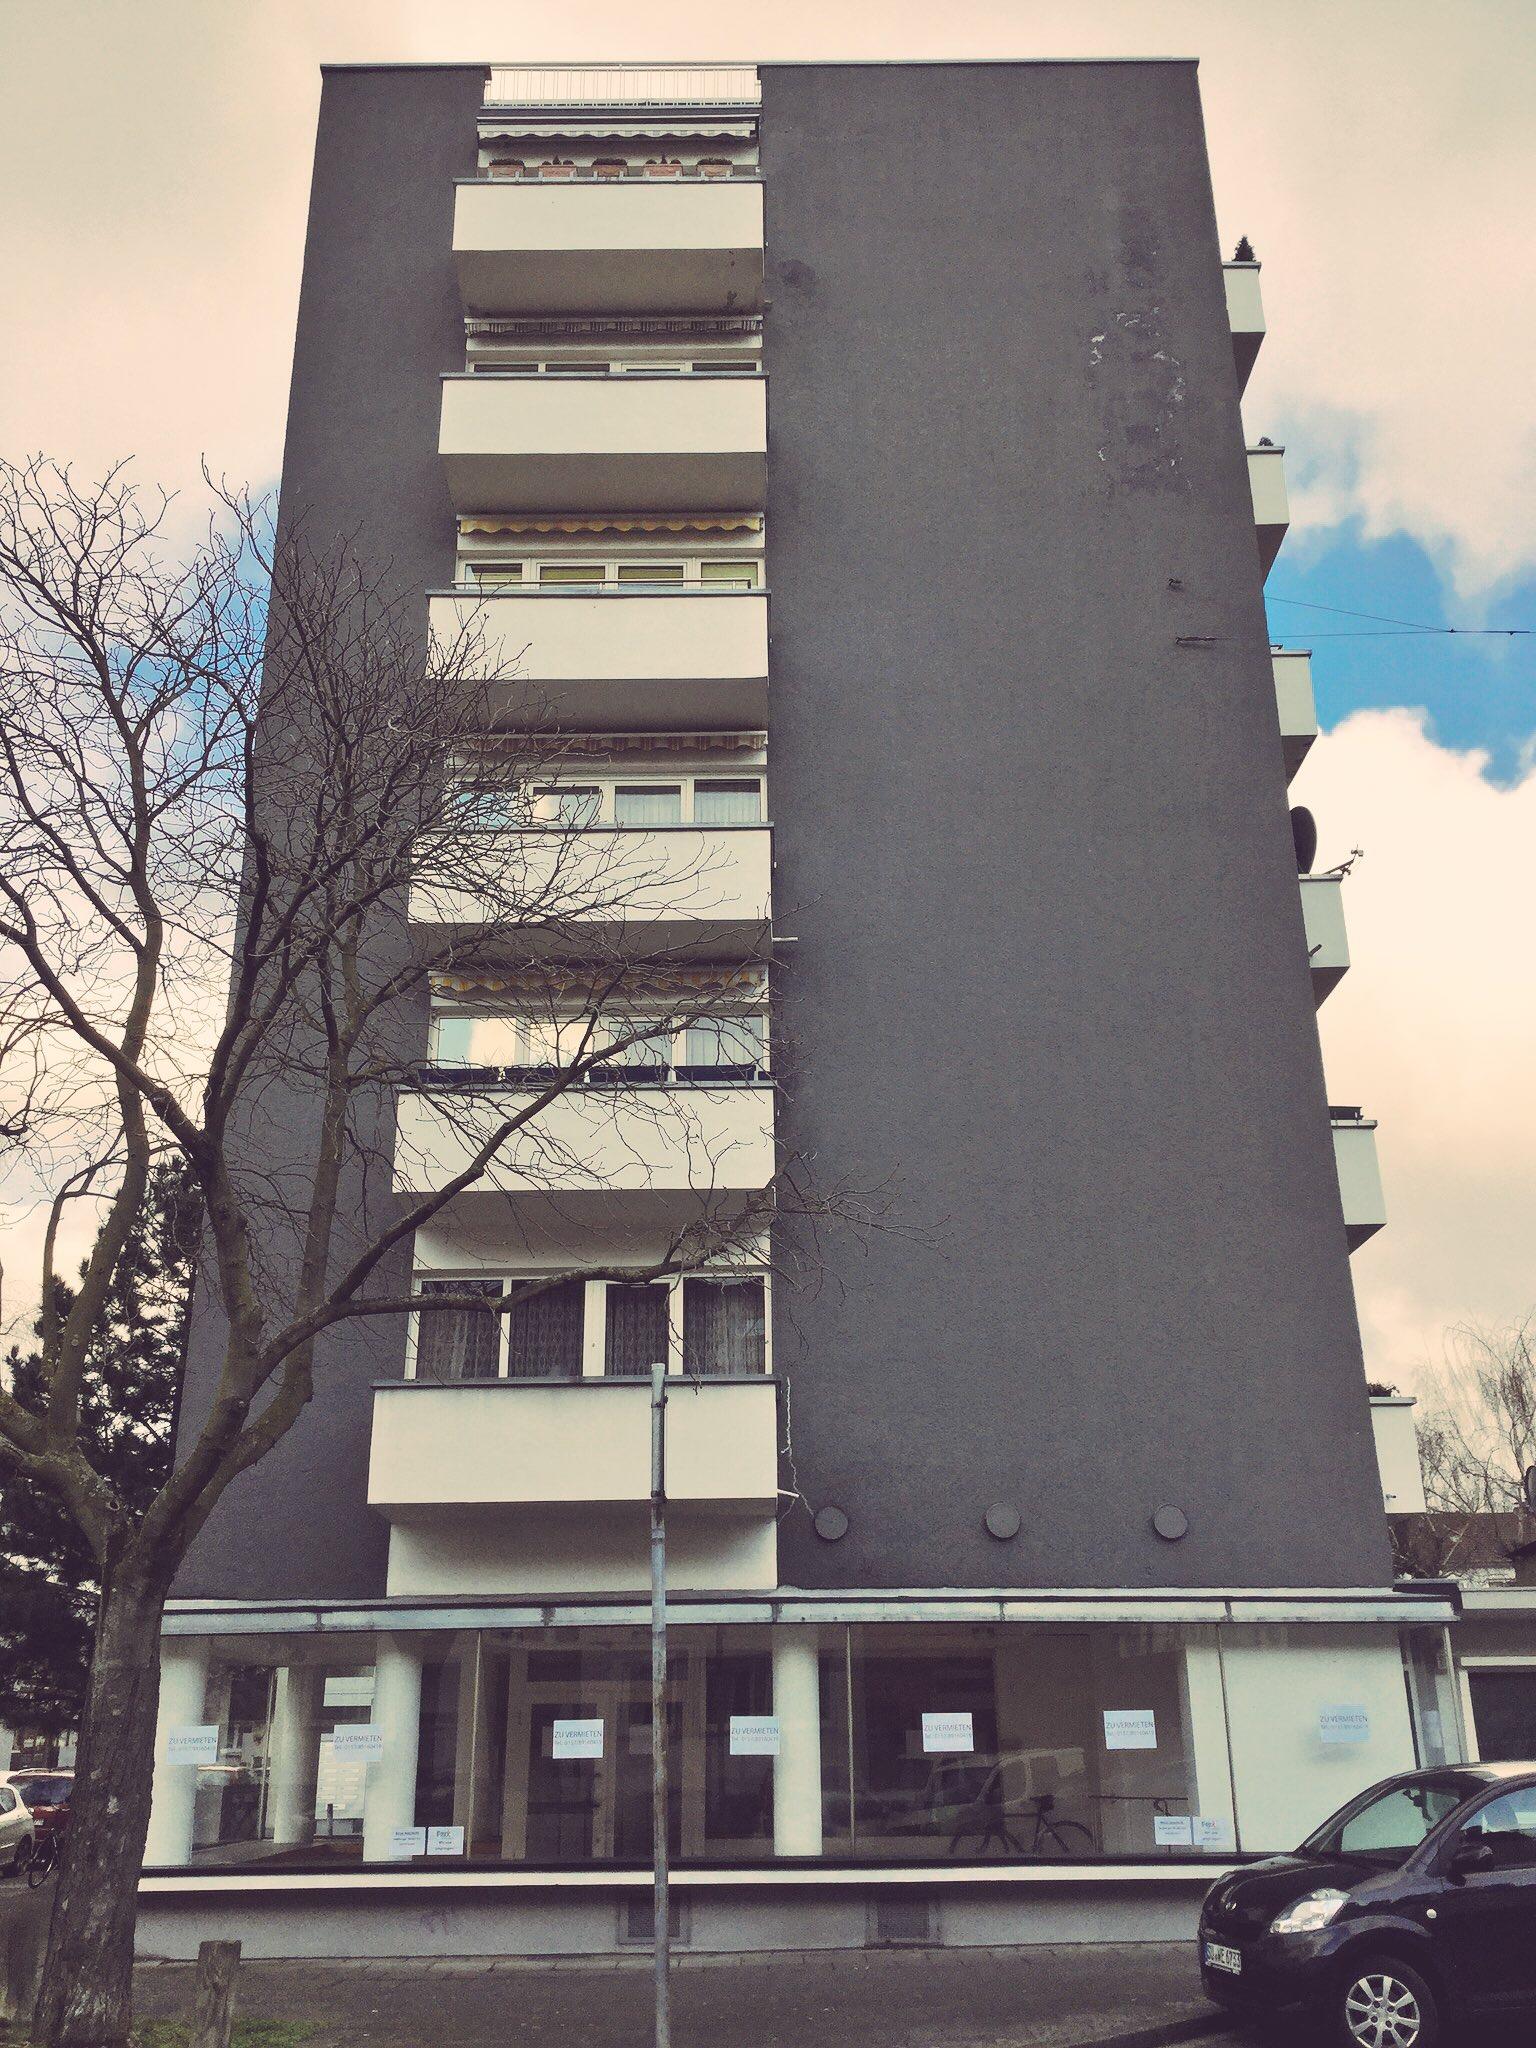 Stadtlabor Bonn Abschluss Mietvertrag für 1. Bonner Stadtlabor #BNLAB -> in der Zingsheimstraße 2